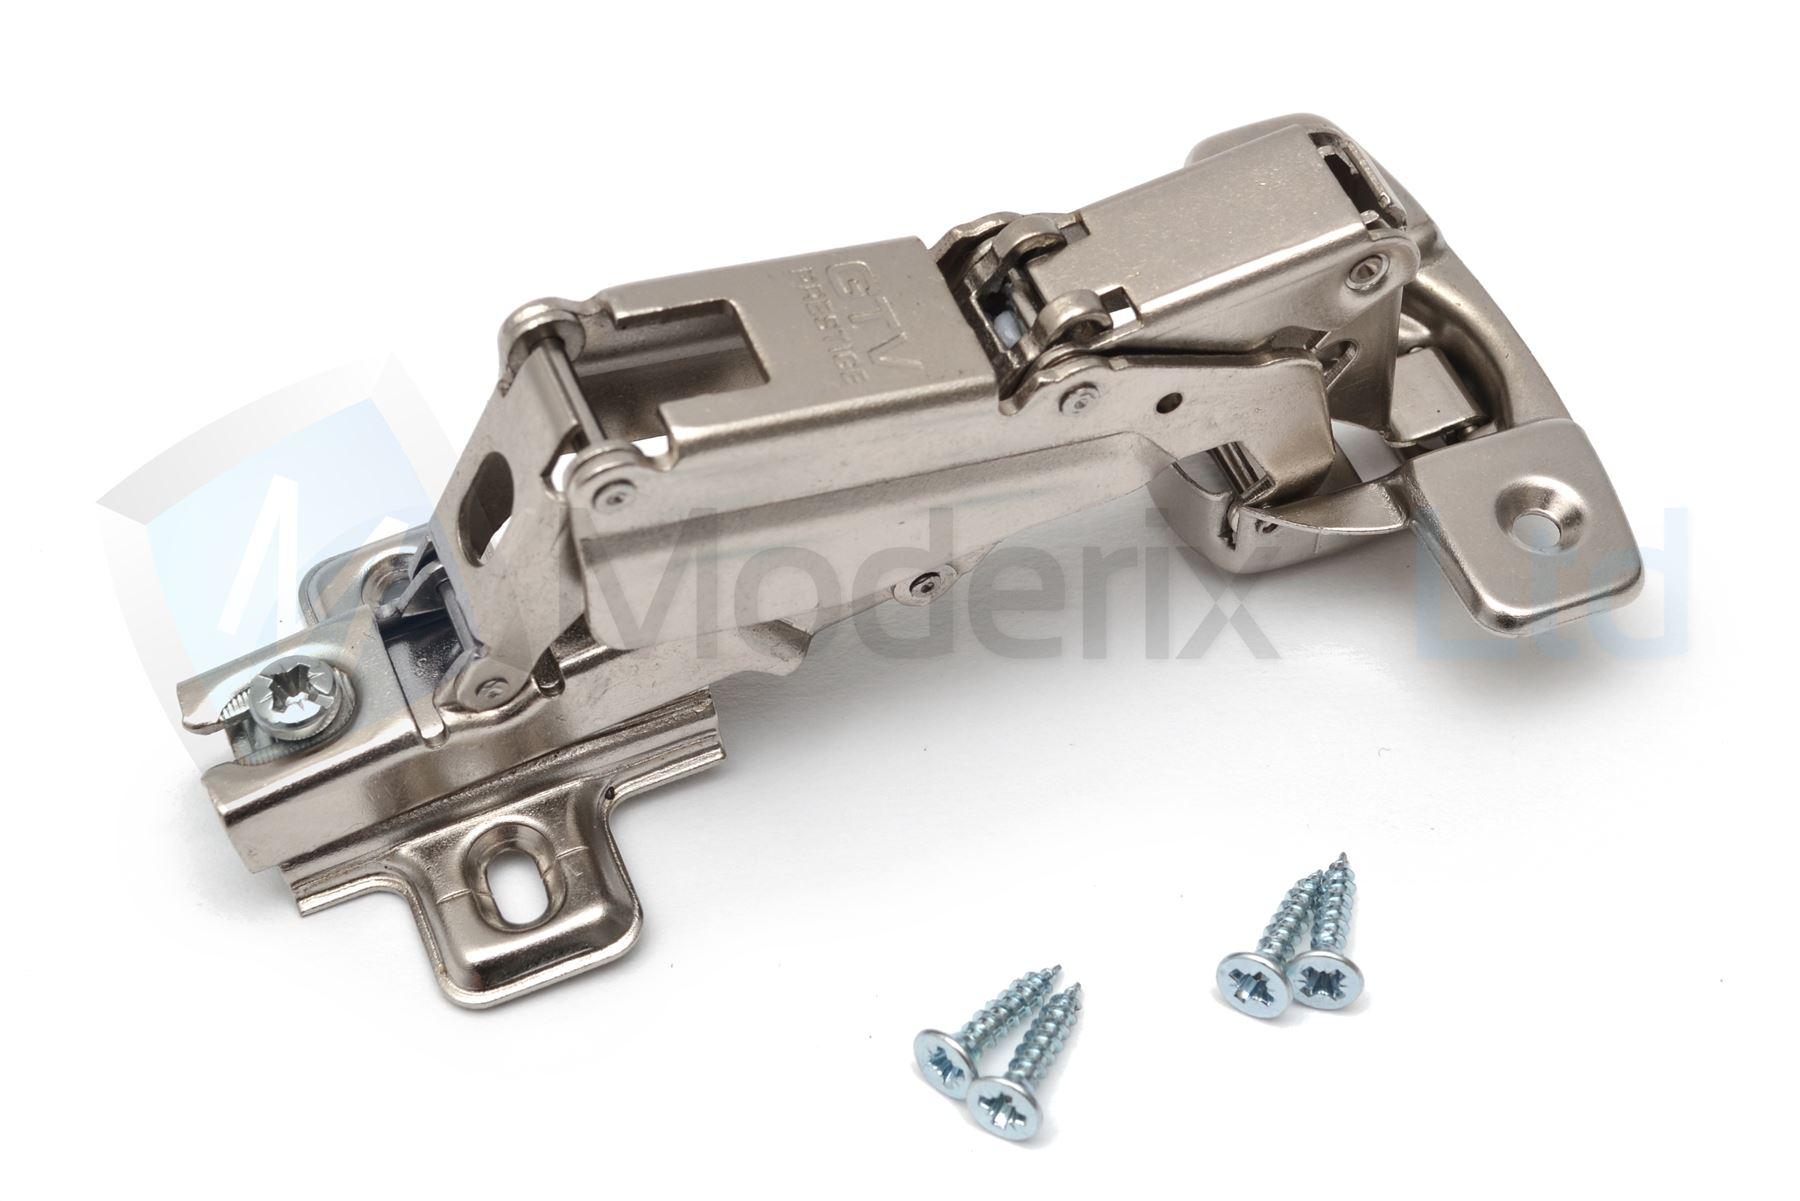 35mm 165 Degree Kitchen Cabinet Wardrobe Door Hinge Angular Screws